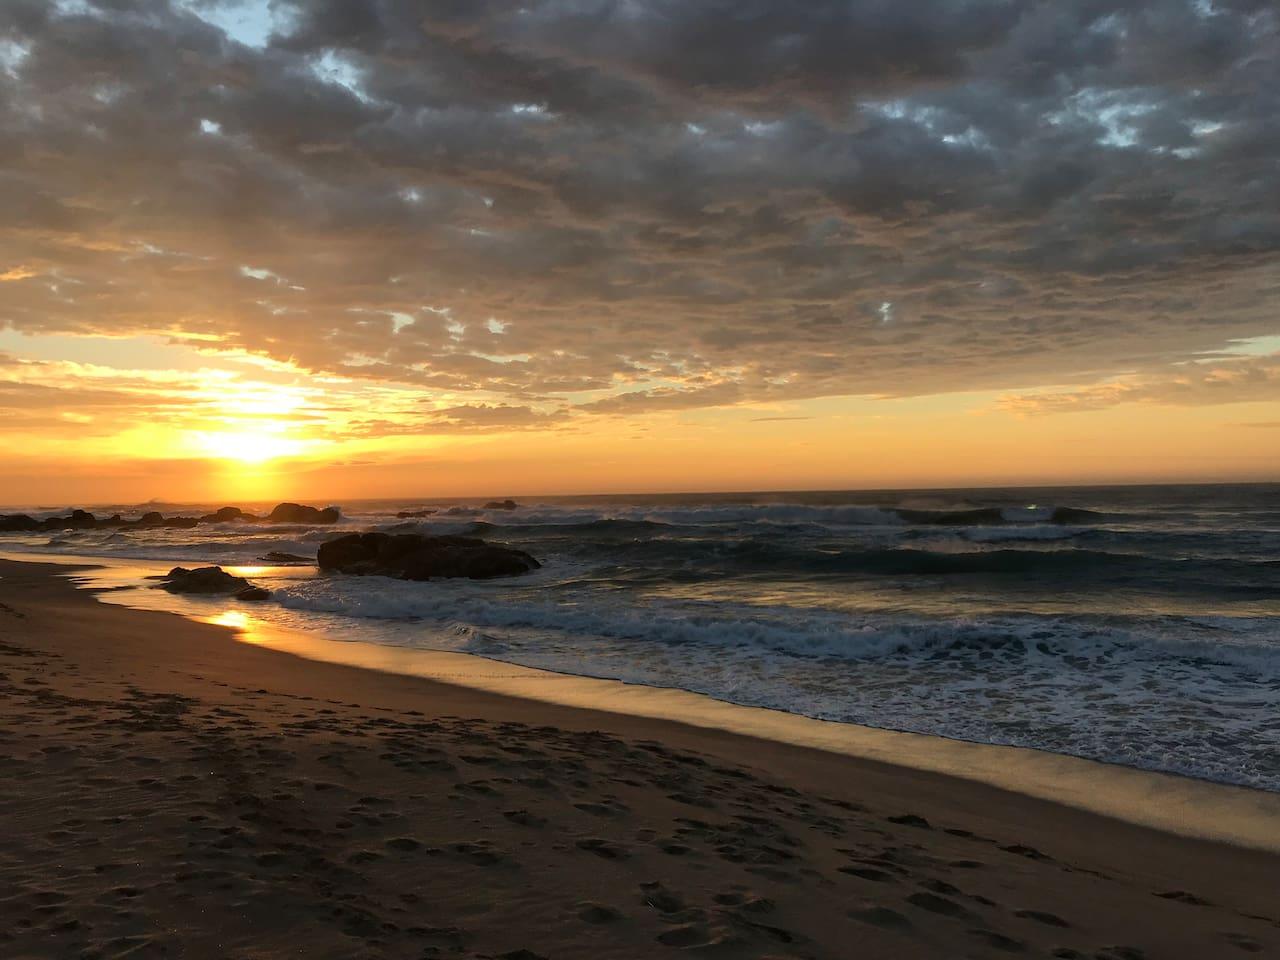 Breathtaking beaches - Southbroom beach